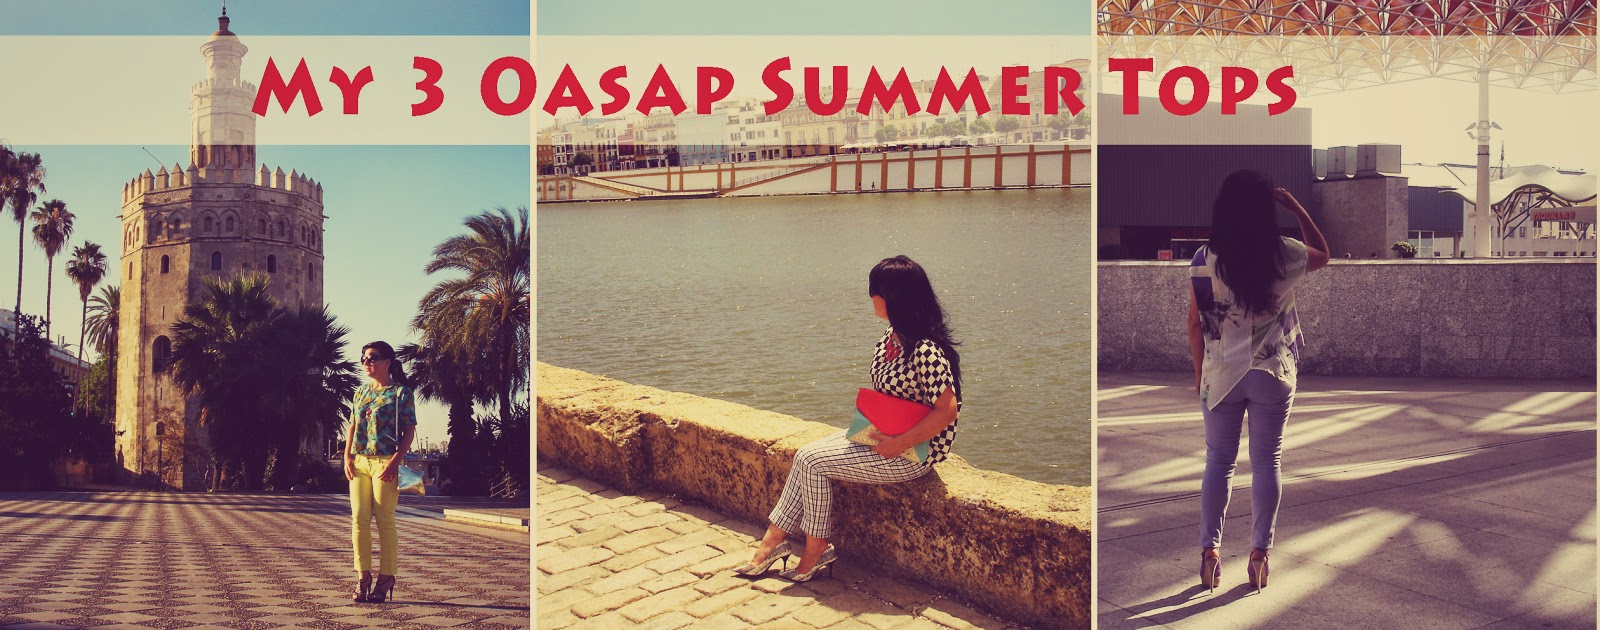 My+3+Oasap+Summer+Tops